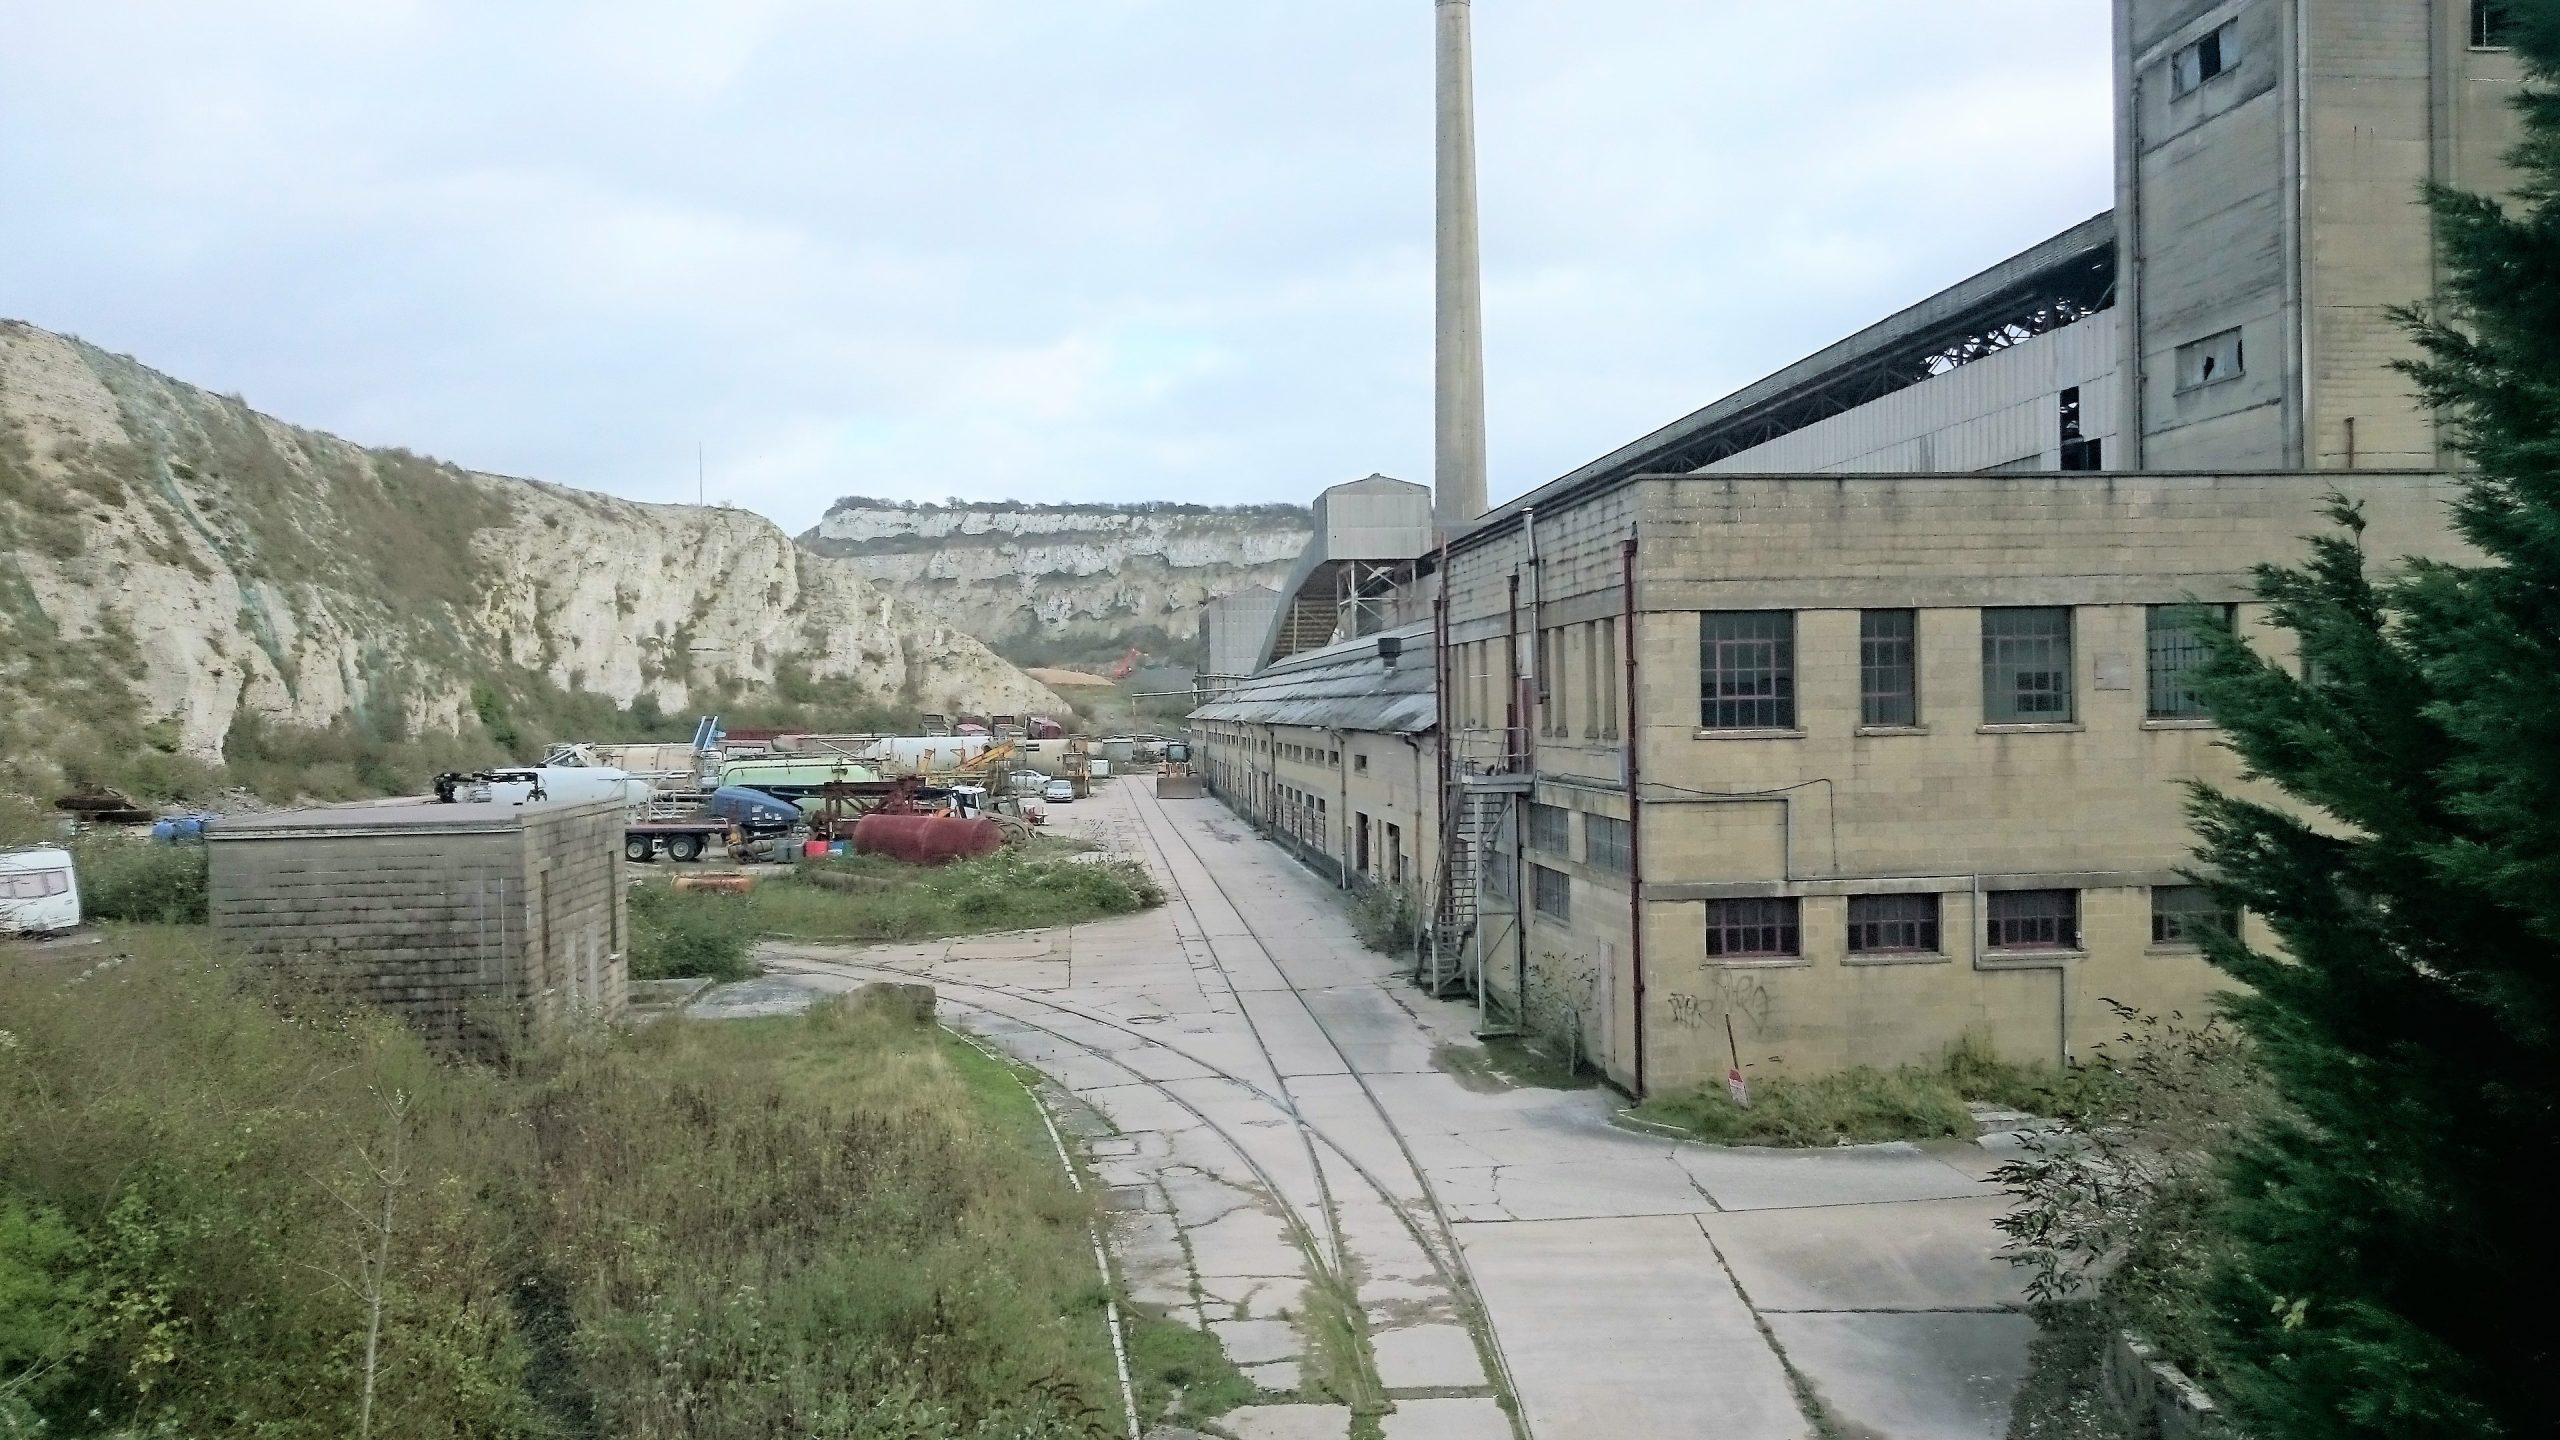 Shoreham Cement Works – restart of Area Action Plan!